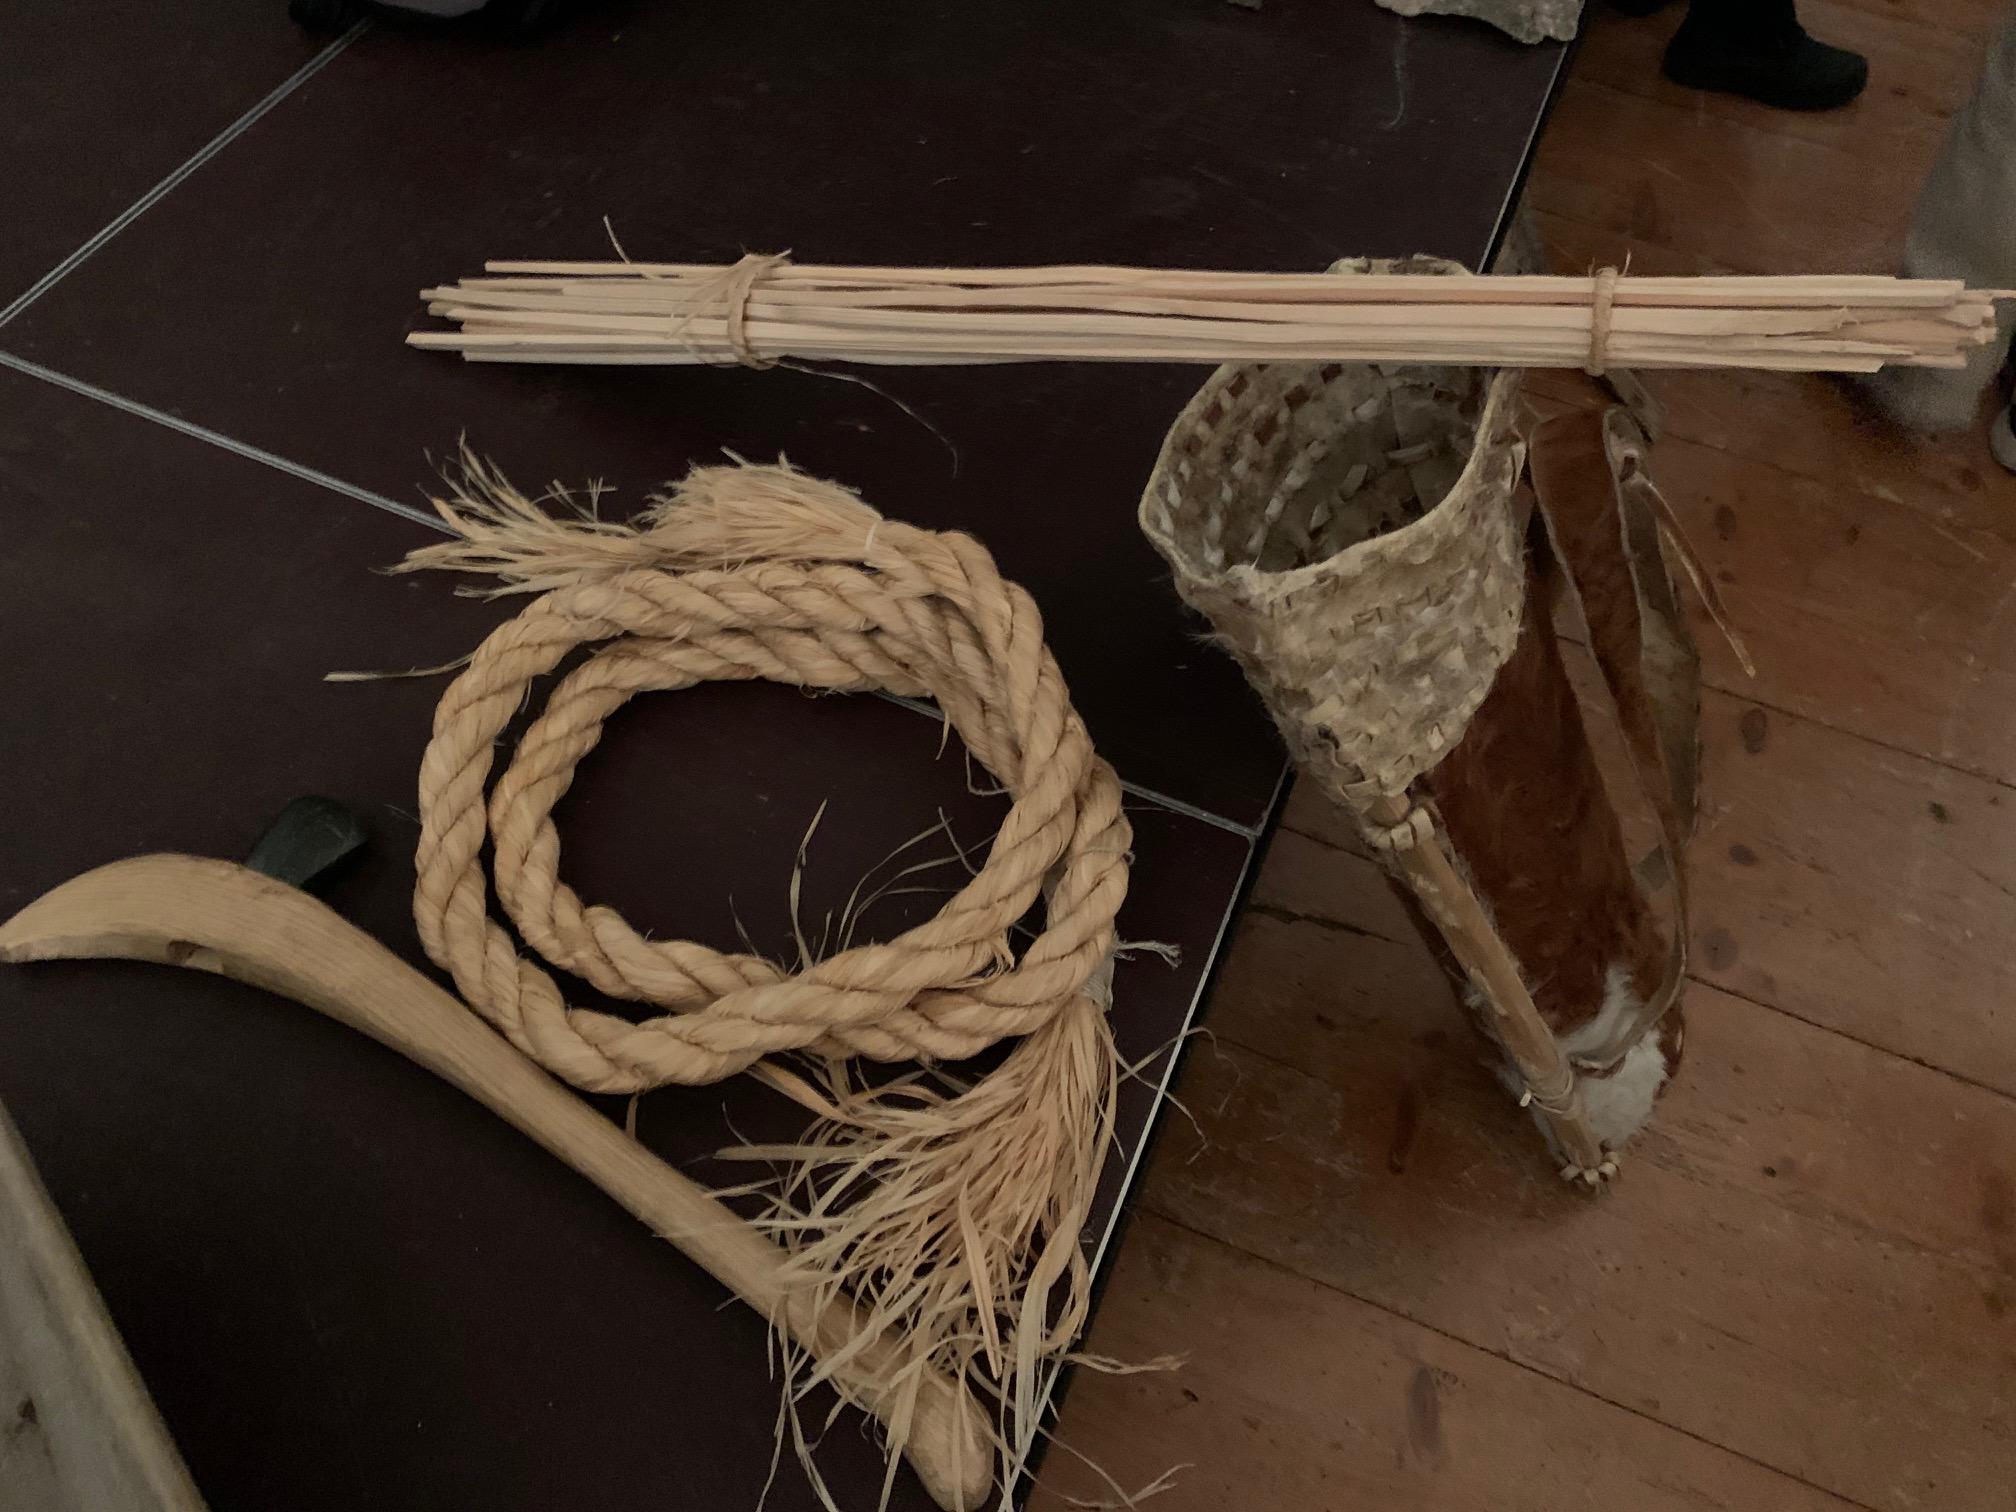 Seil aus Lindenbast, Tragesack, Leuchtspäne aus Tannenholz